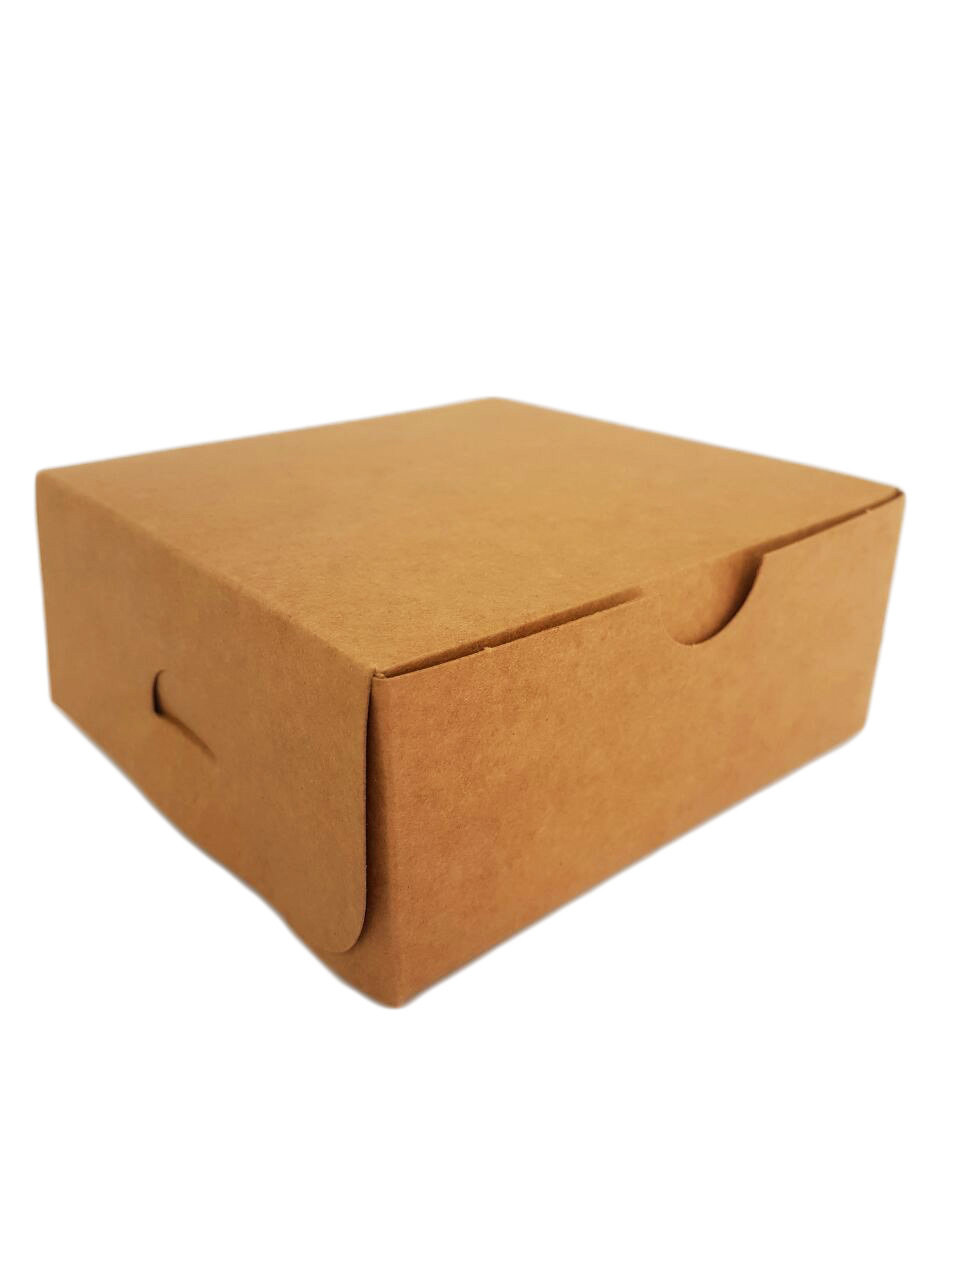 Cake Box Eco Brown 5 x 5 x 2.5